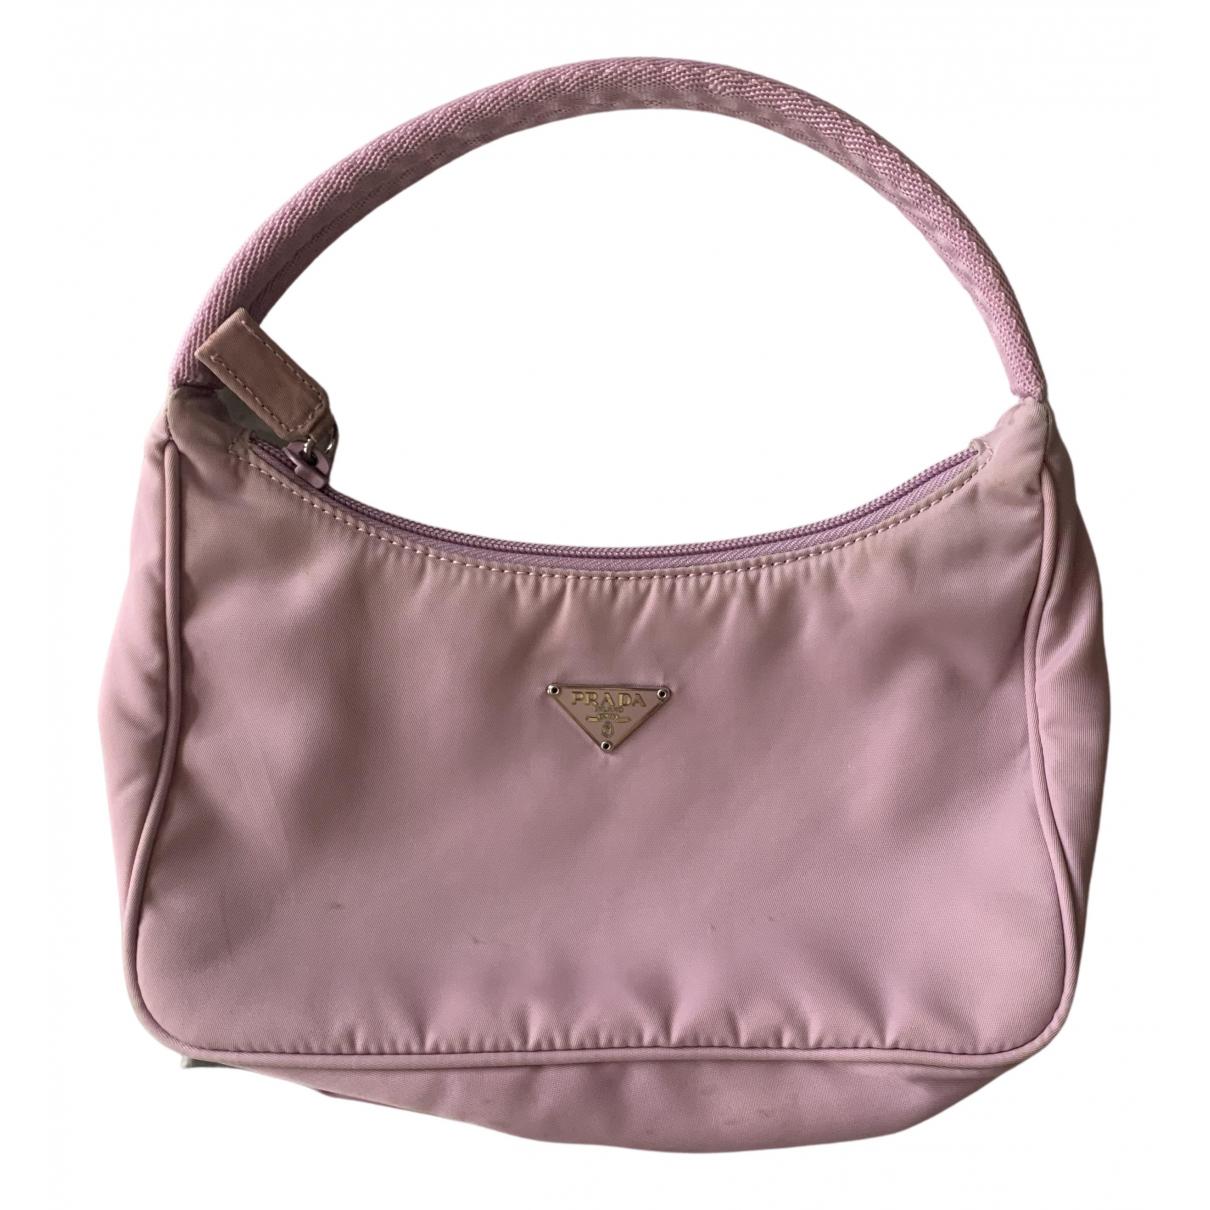 Prada N Pink Cloth handbag for Women N